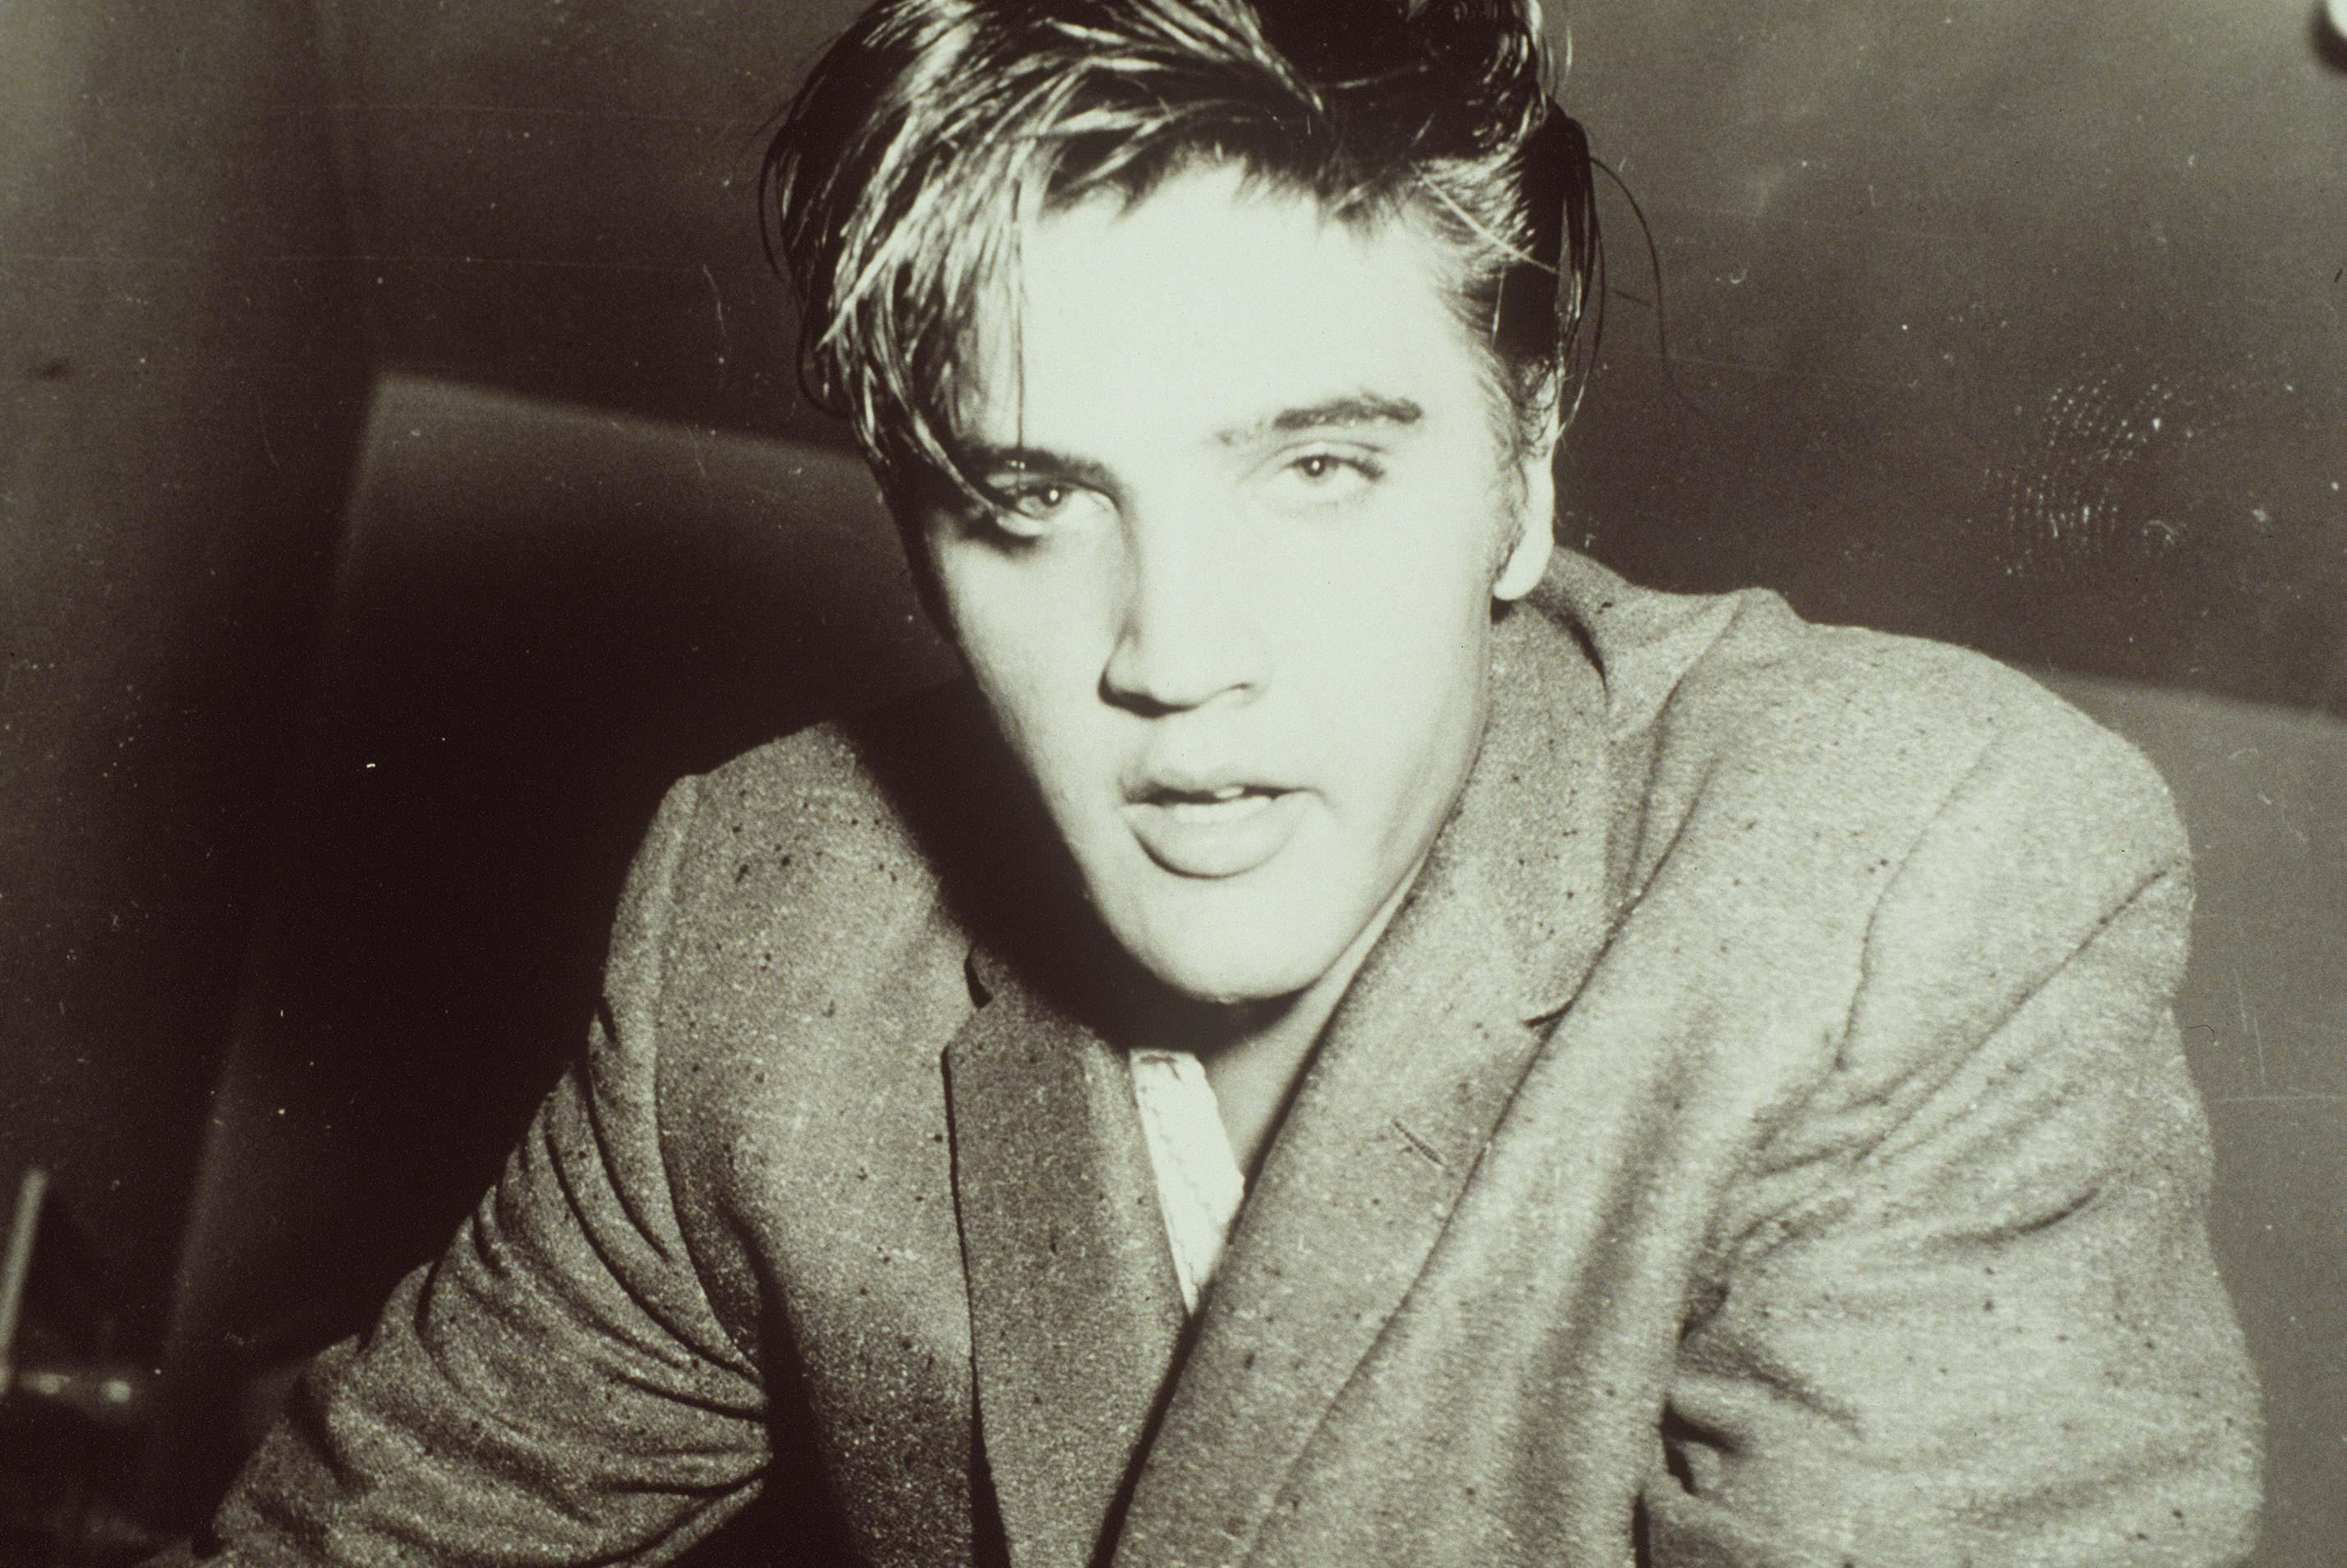 Elvis Presley Wallpapers Wallpaper Cave